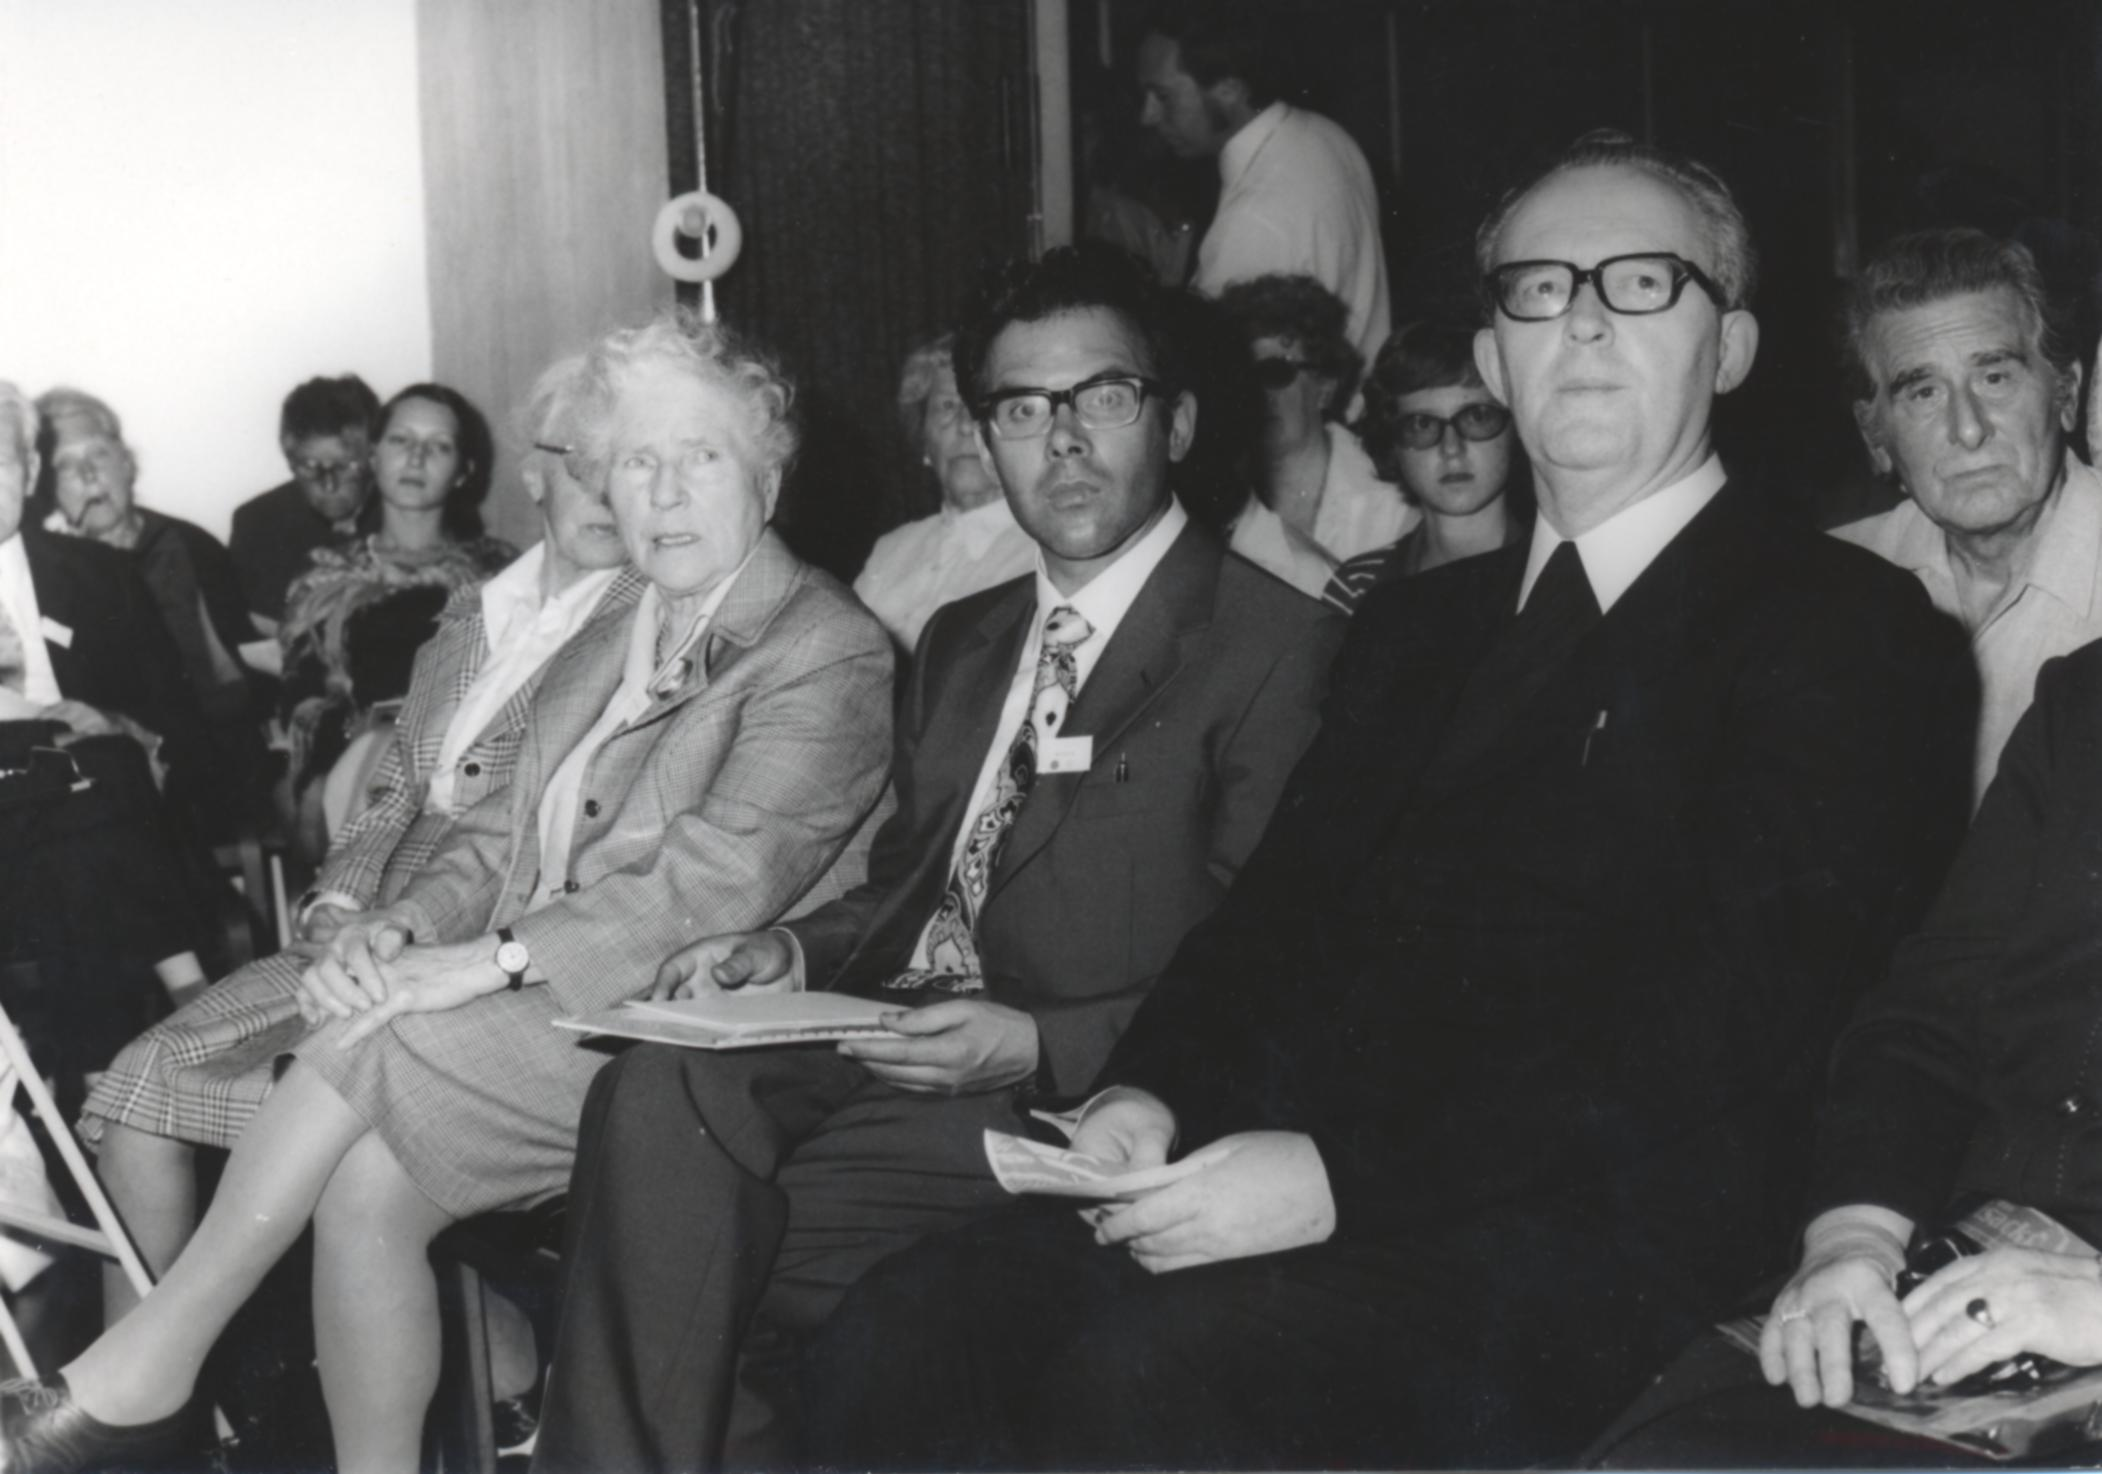 V. Internat. Imago Mundi-Kongress 1974, Cusanus Akademie, Brixen, Prof. Andreas Resch neben Bischof Josef Gargitter